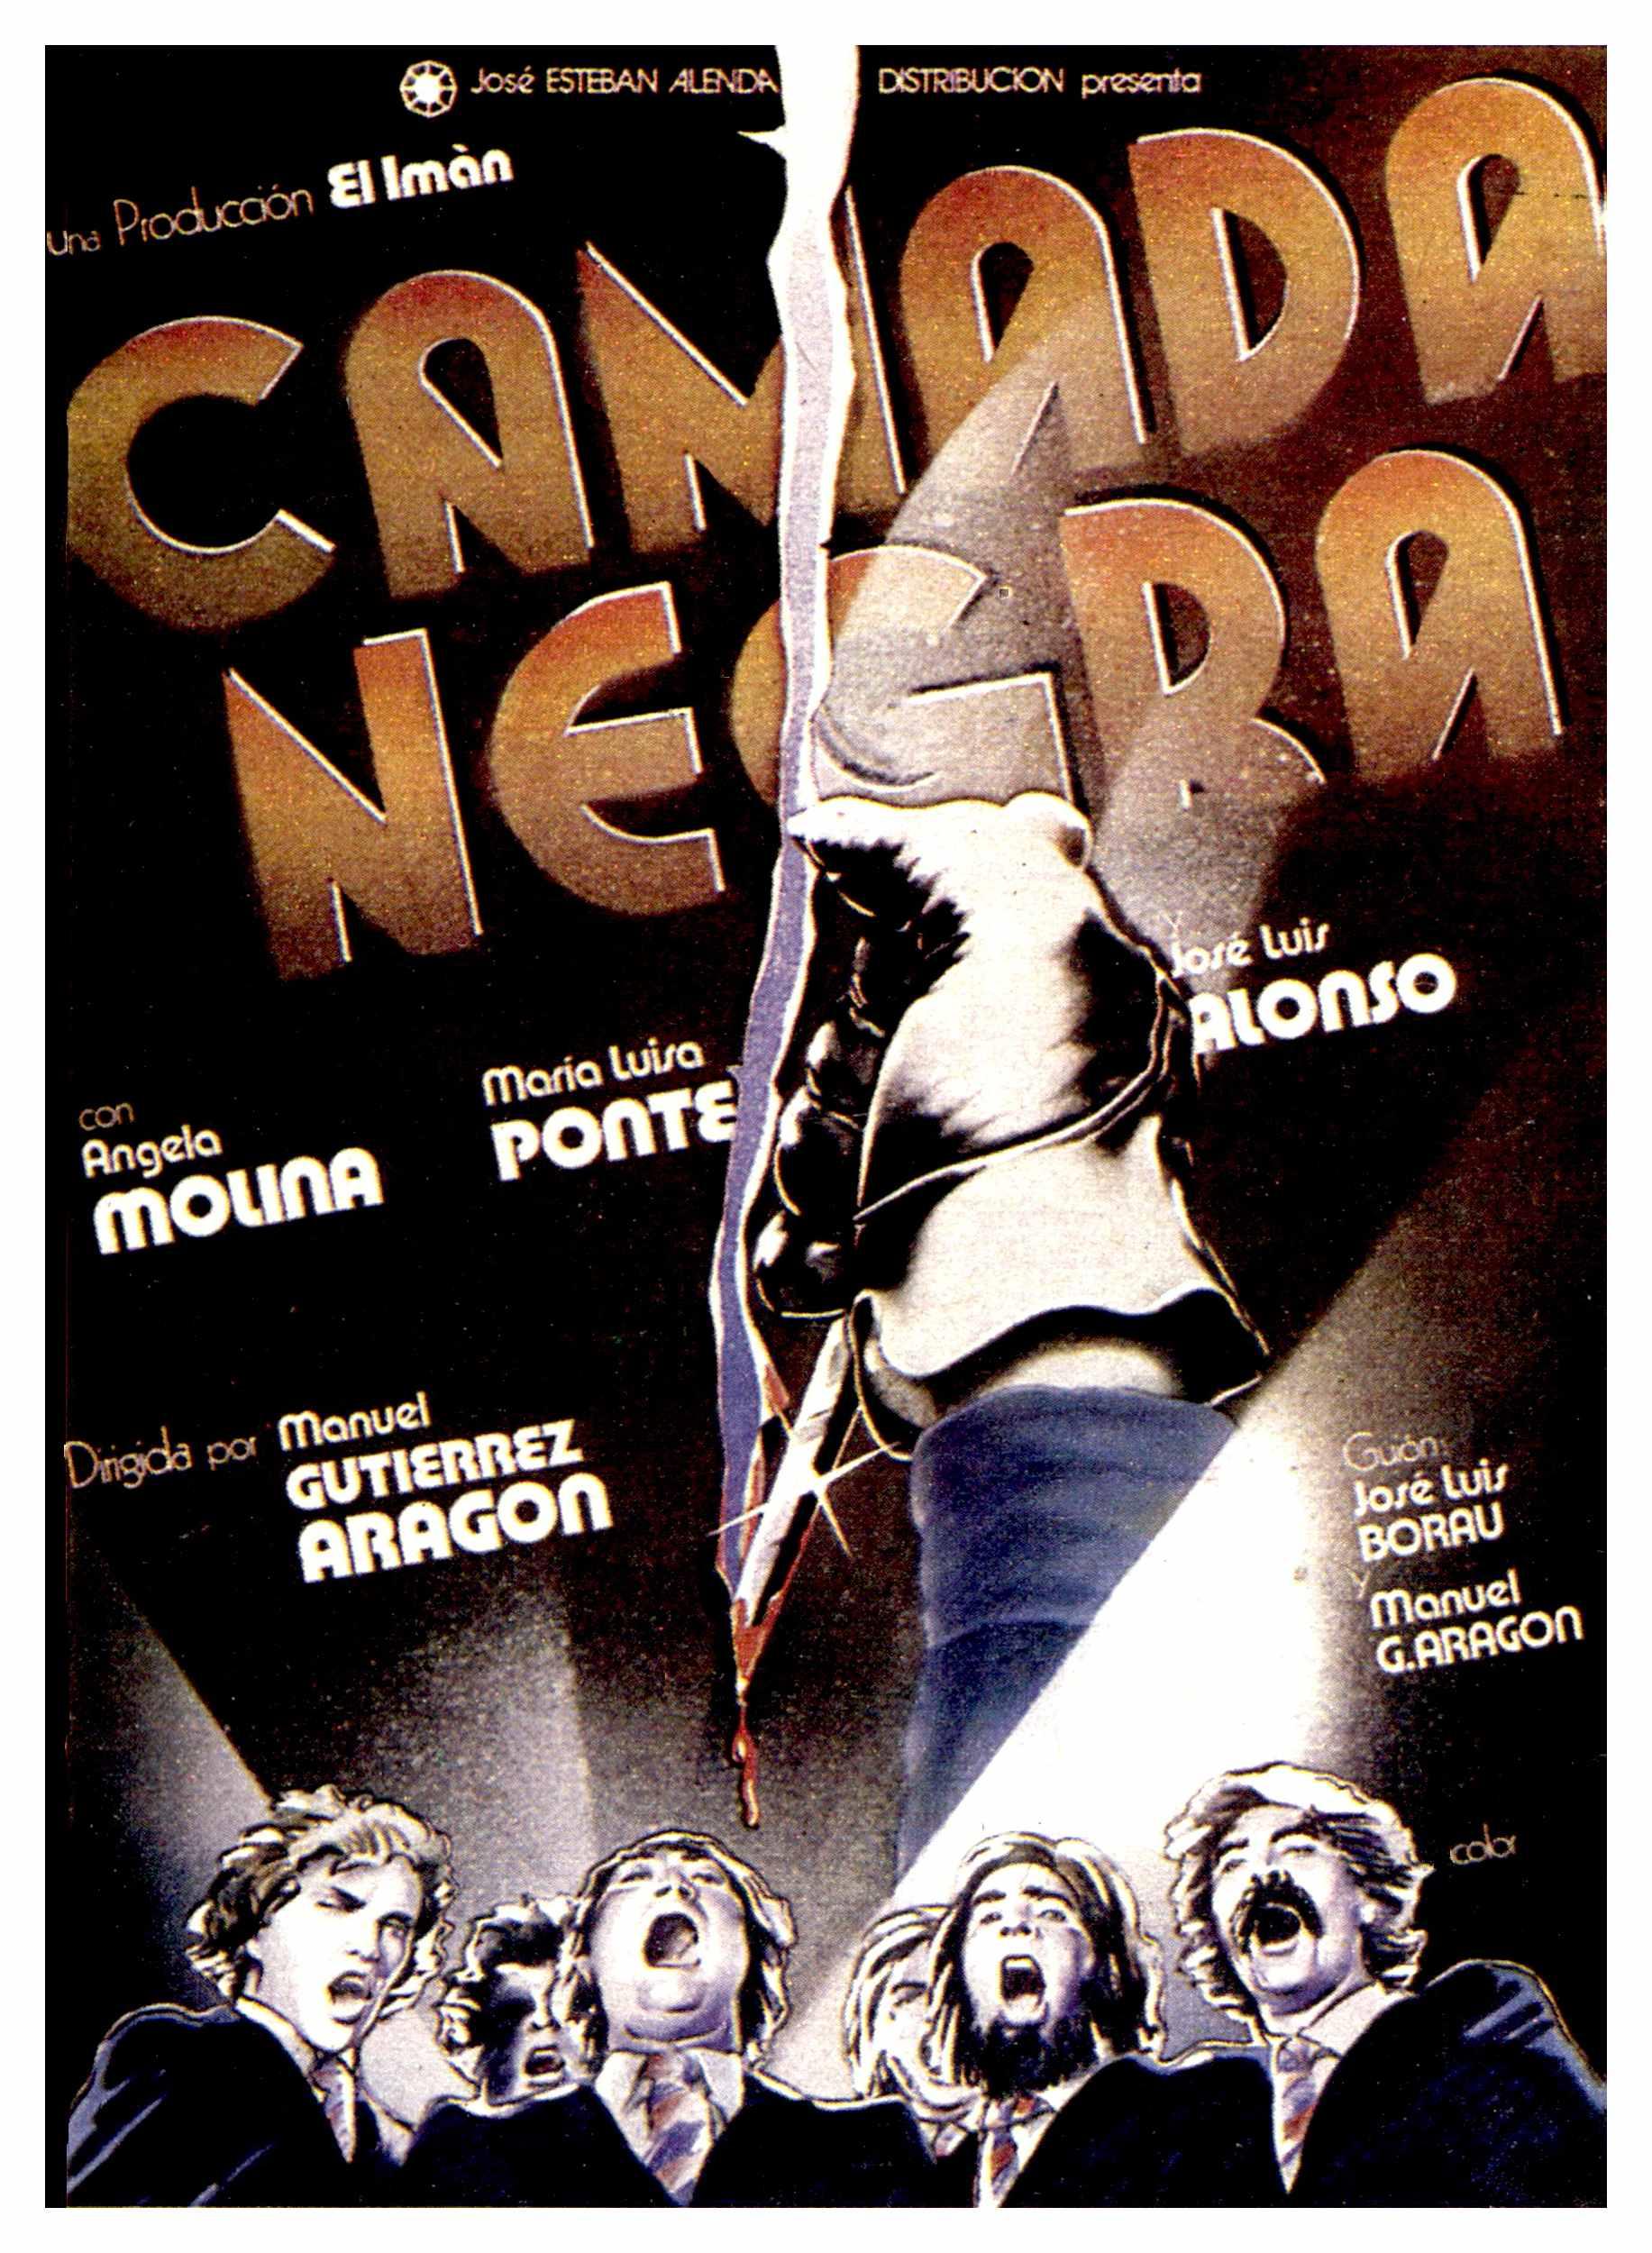 1977 Camada negra (esp) 01.jpg